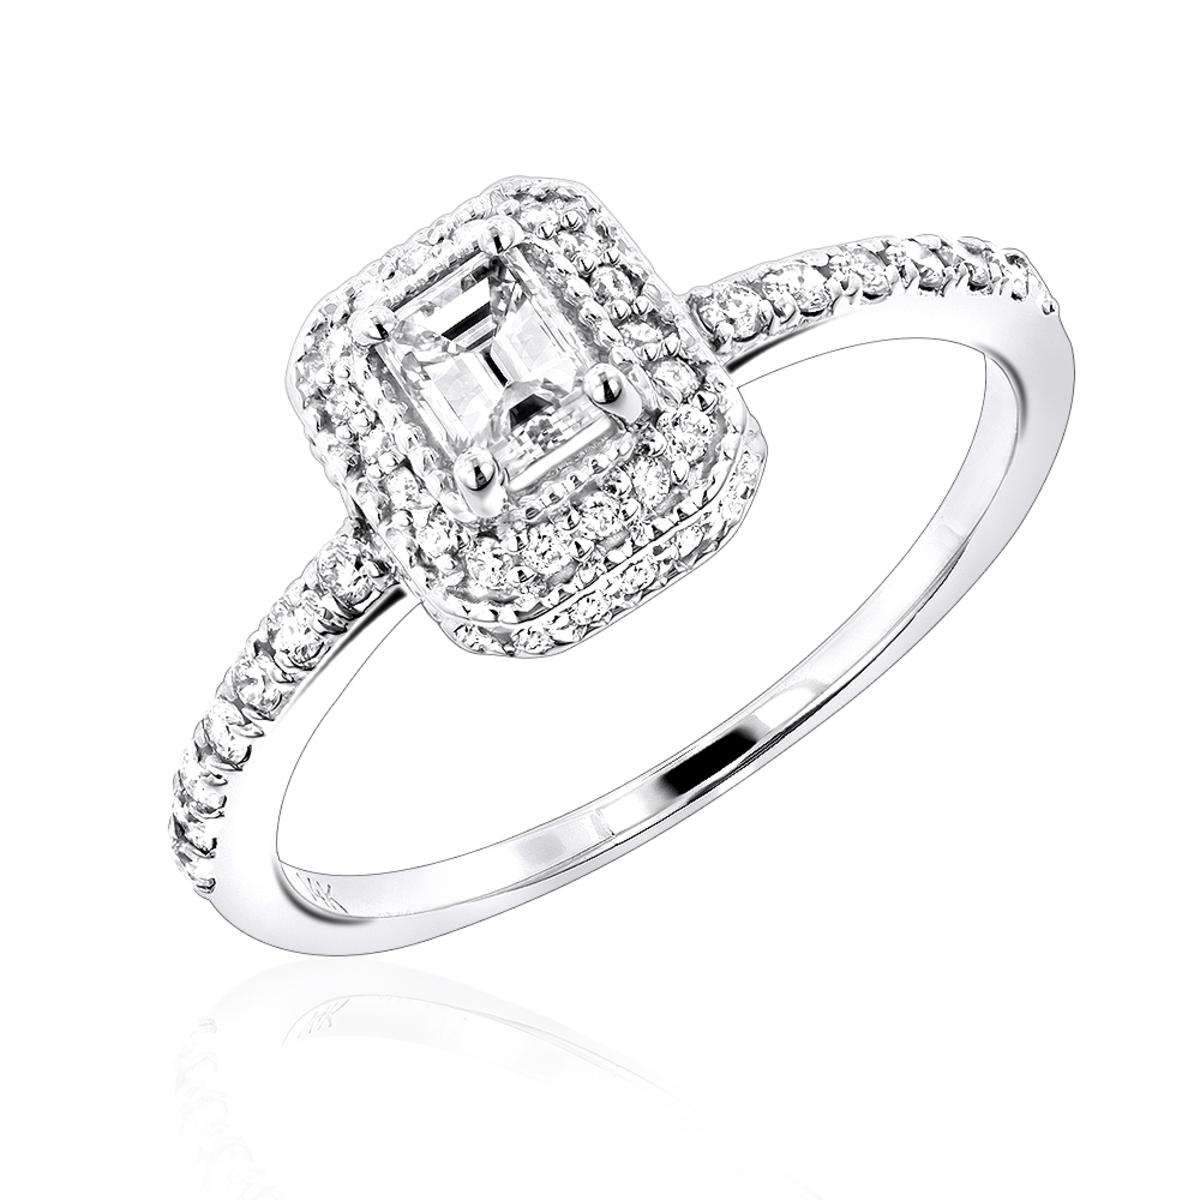 14K Gold Unique Diamond Engagement Ring 0.75ct